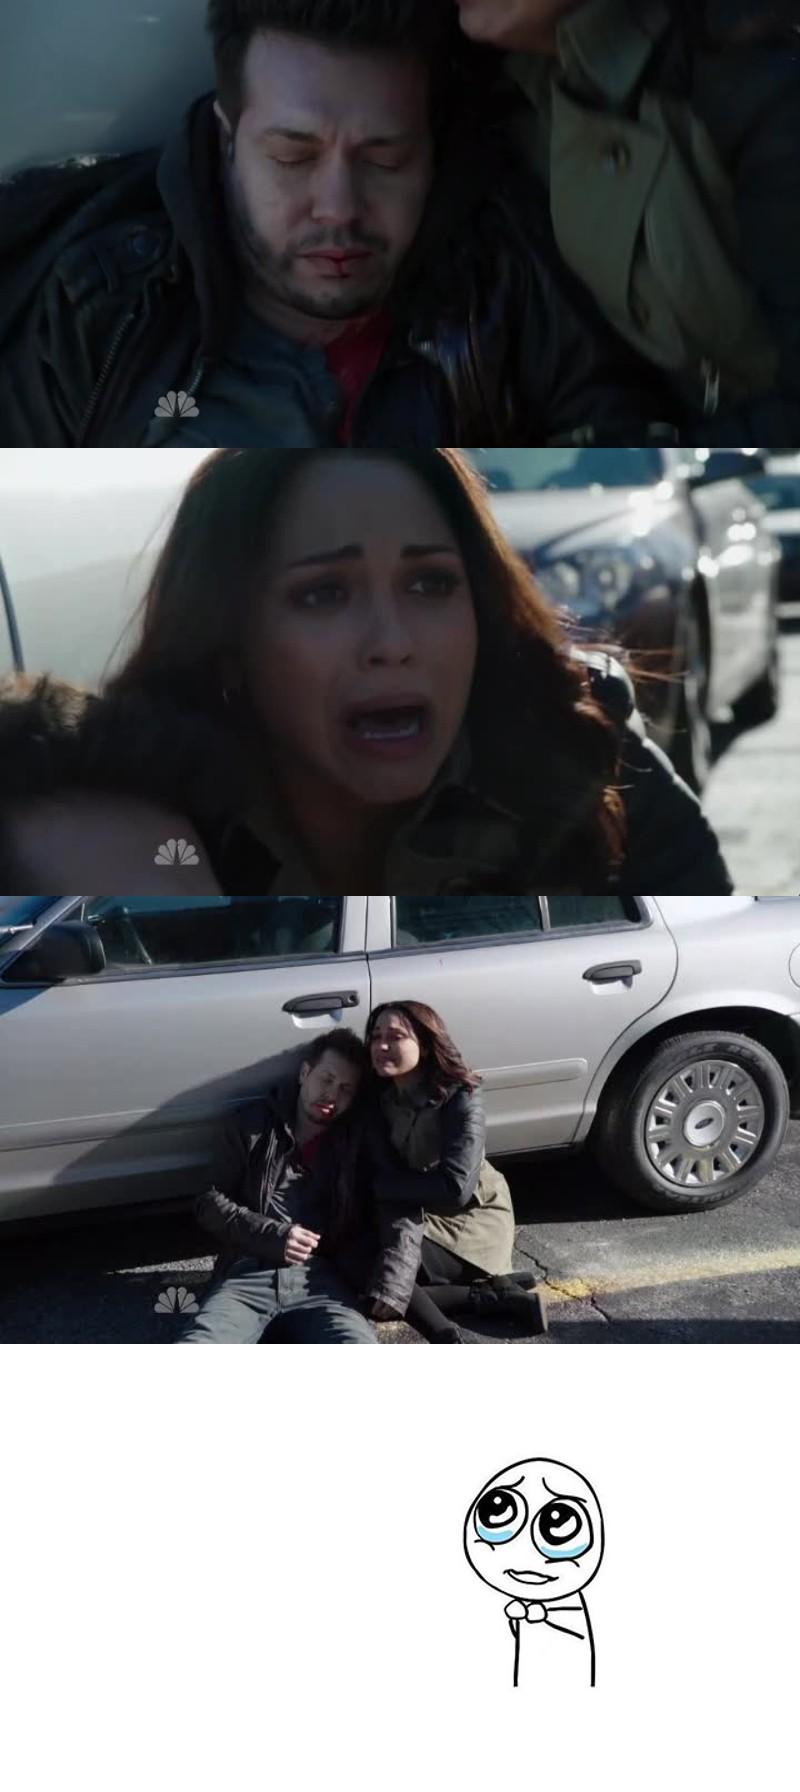 The ending was so heartbreaking. Poor Gabby... :(